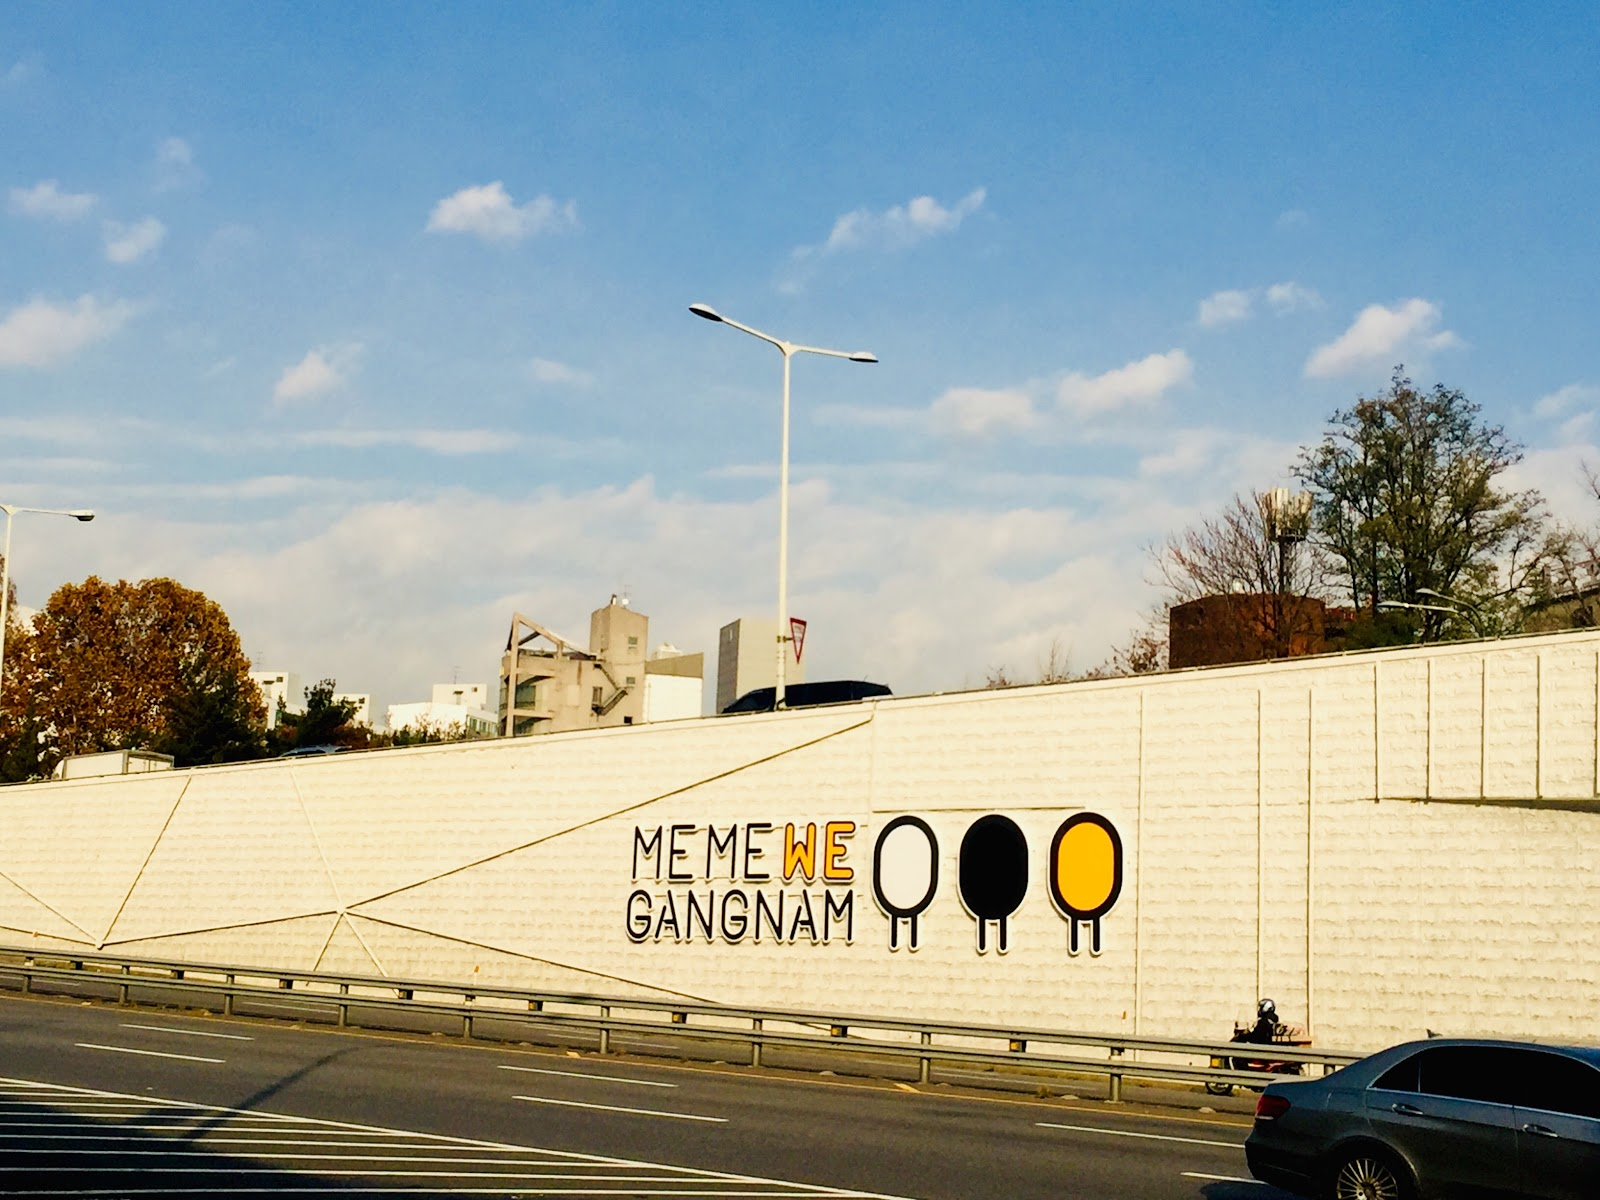 Gangnam2